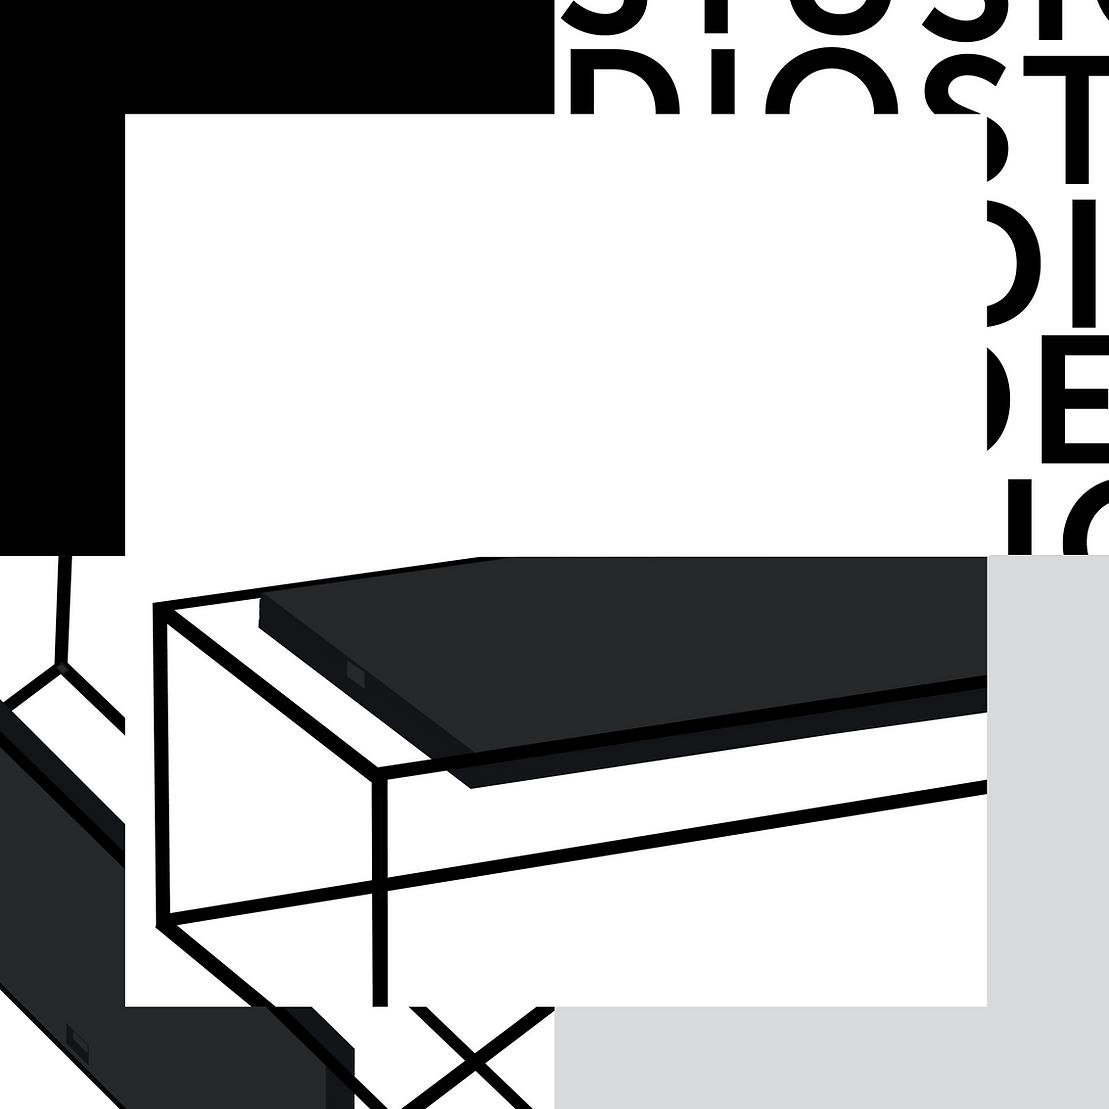 Hintergründe_AC_DesignStudio_20193.png